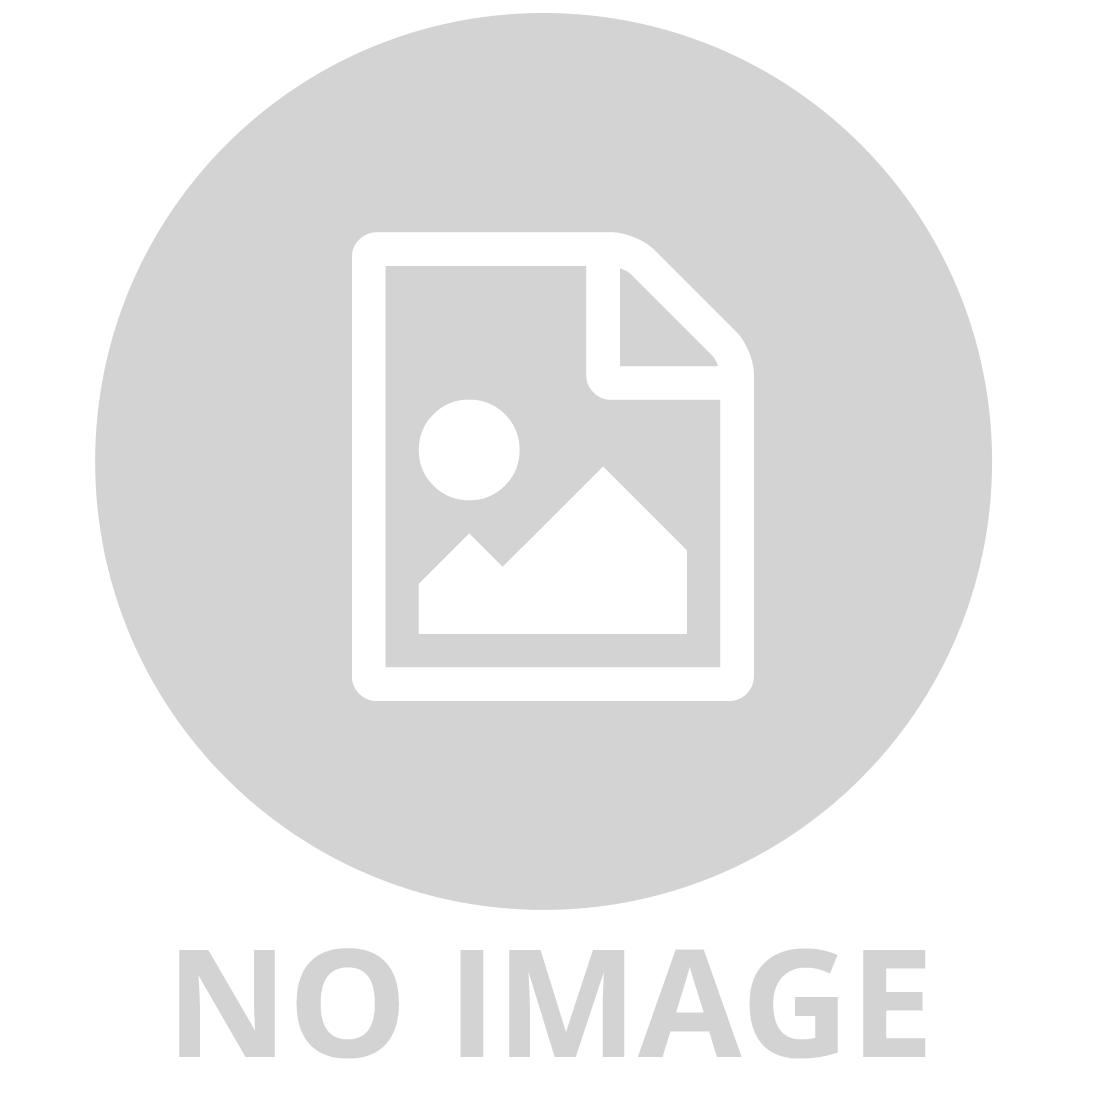 100 EASY MAGIC TRICKS